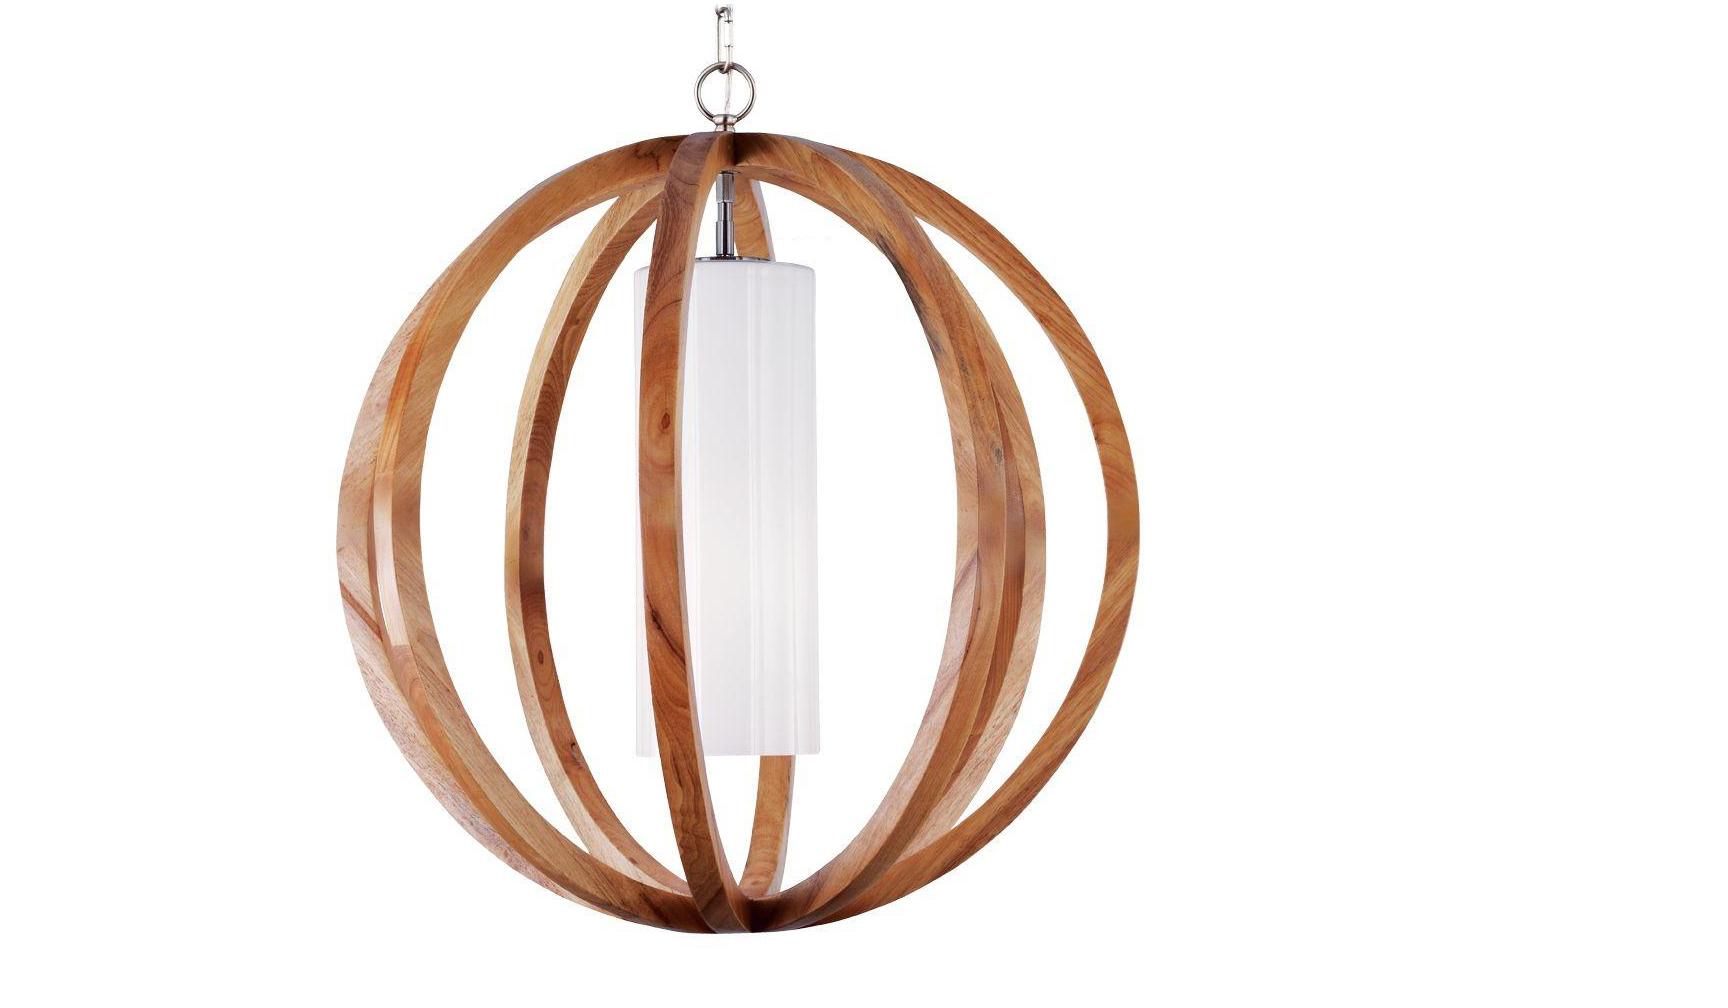 light-wood-brushed-steel-feiss-pendant-lights-f2952-1lw-bs-64_1000.jpg